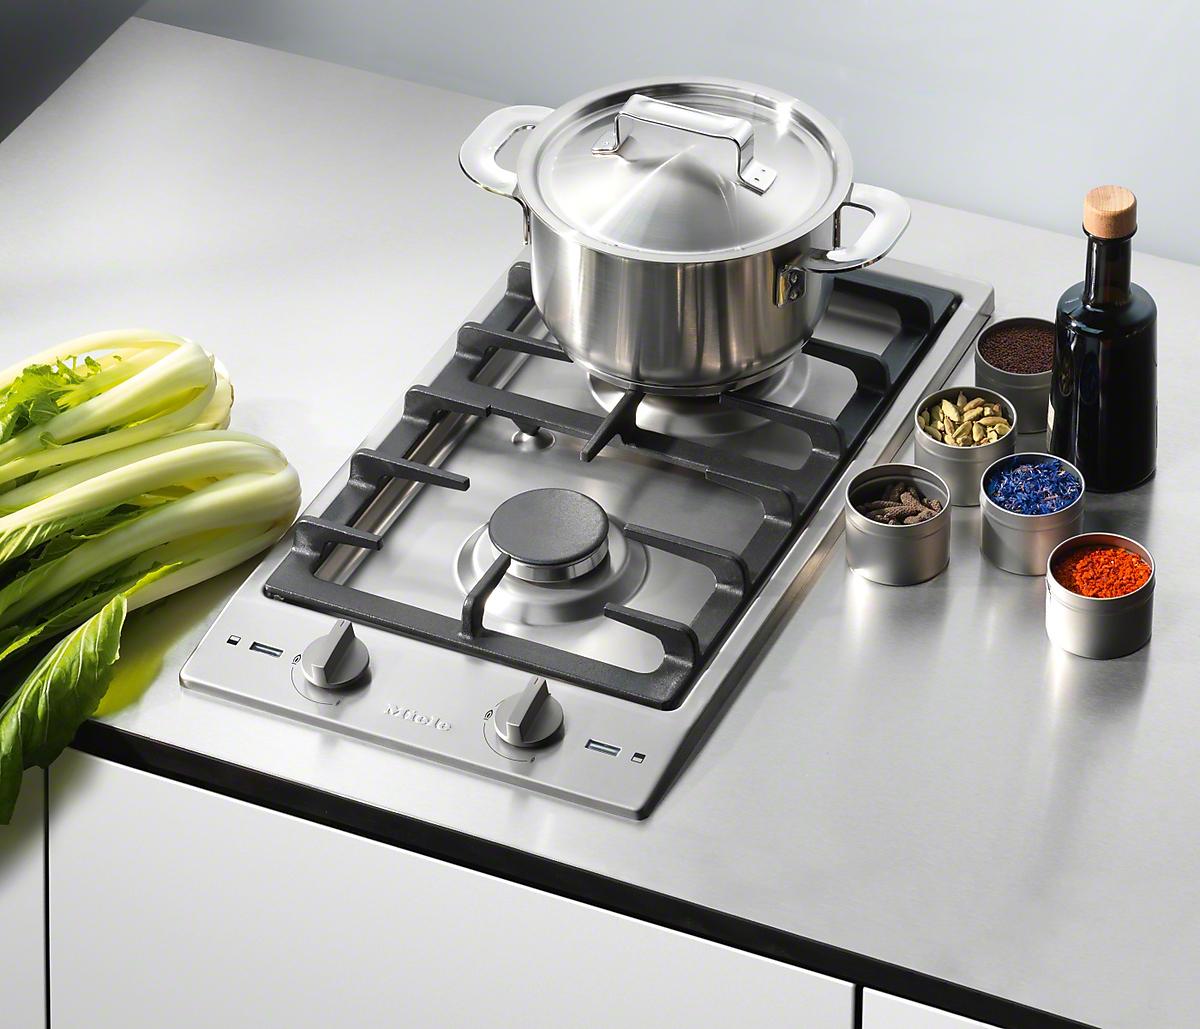 miele tables de cuisson cs 1012 1 g l ment proline. Black Bedroom Furniture Sets. Home Design Ideas